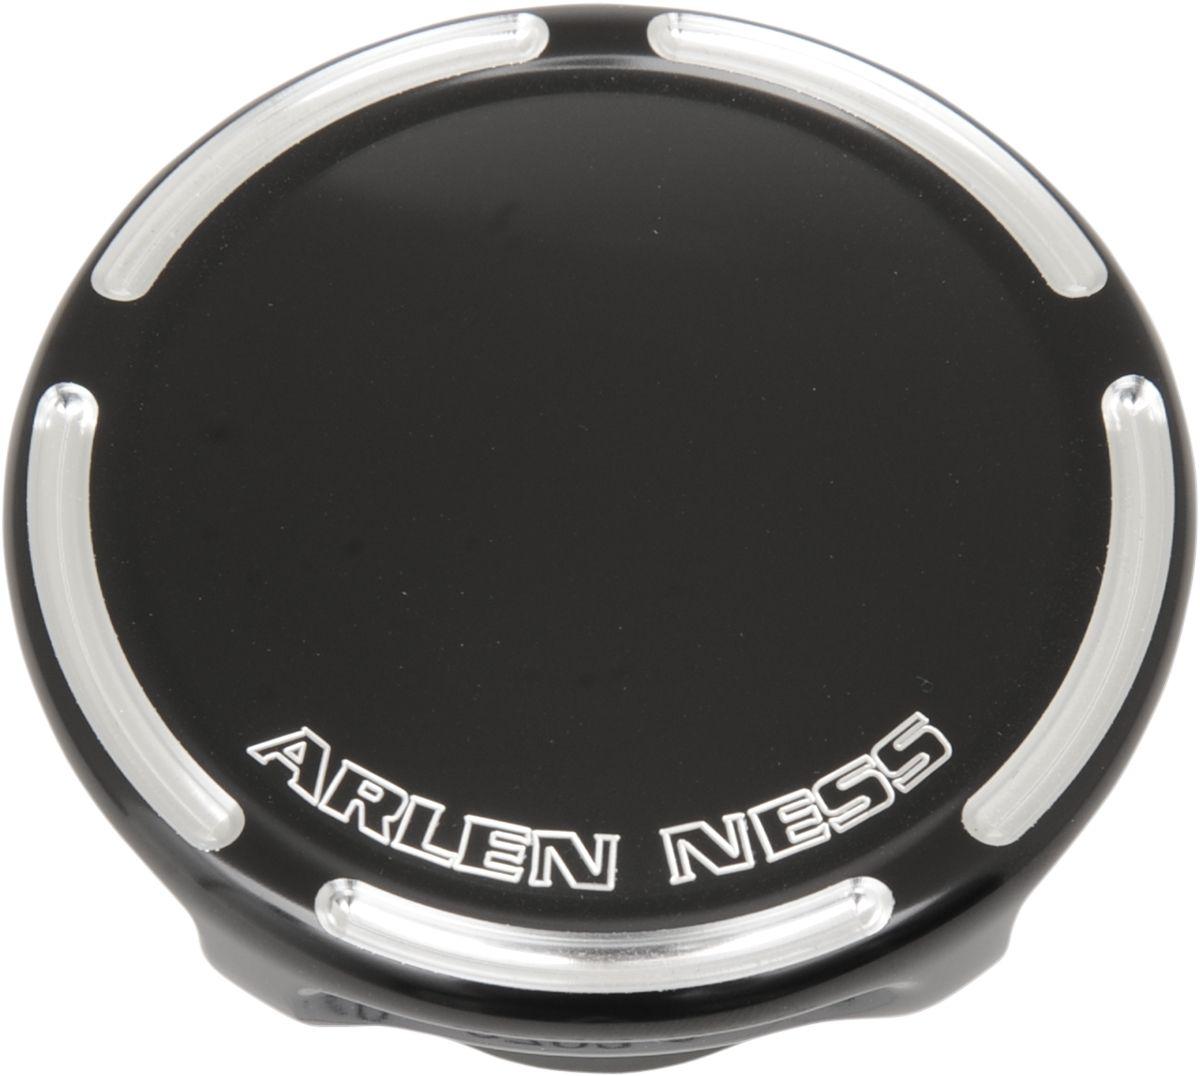 【ARLEN NESS】油箱蓋 SLOT NON/VNT - 「Webike-摩托百貨」